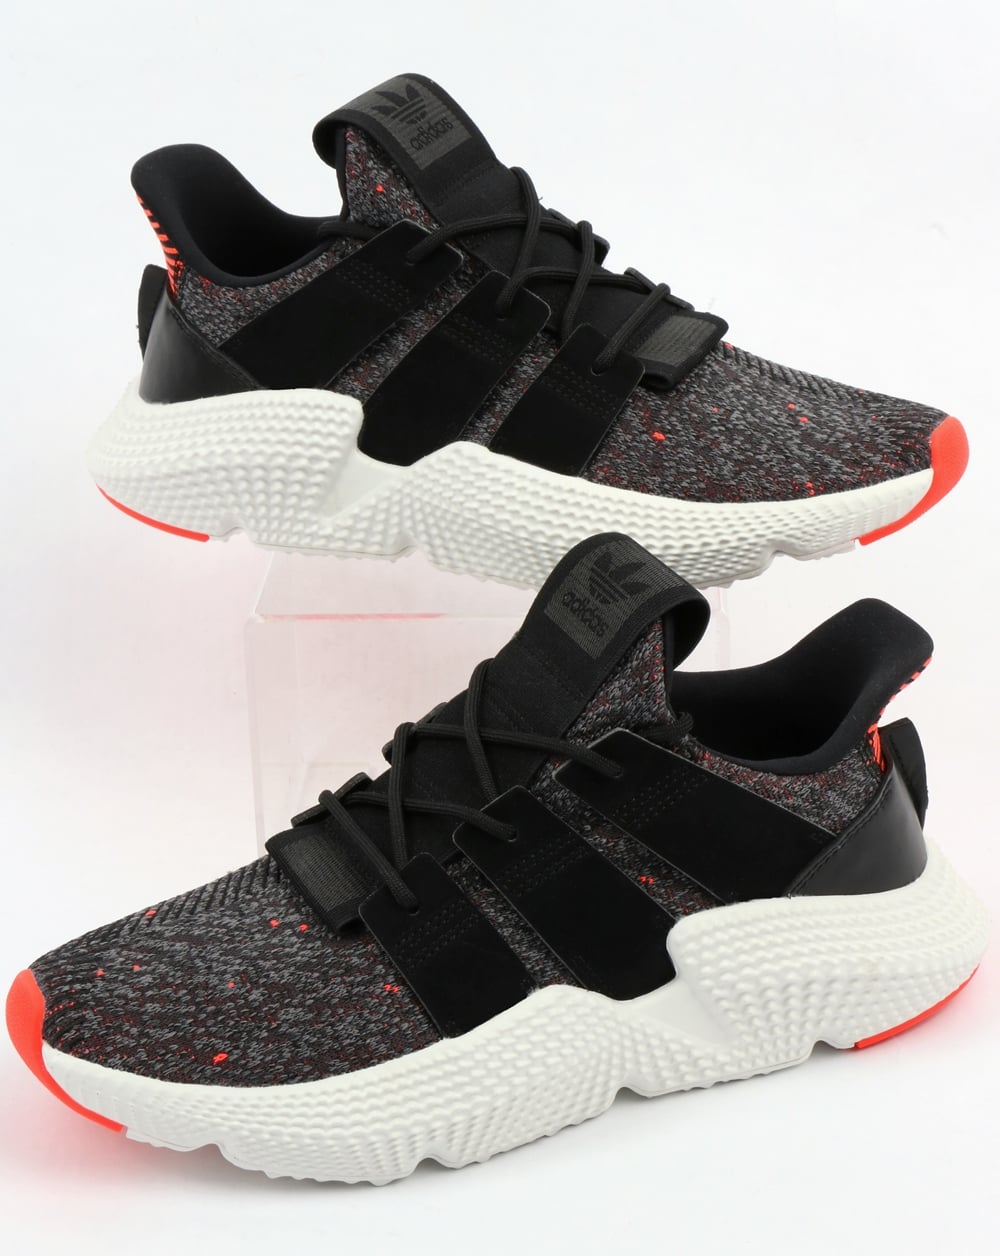 Adidas Prophere Trainers Black Black Solar Red 76af66611